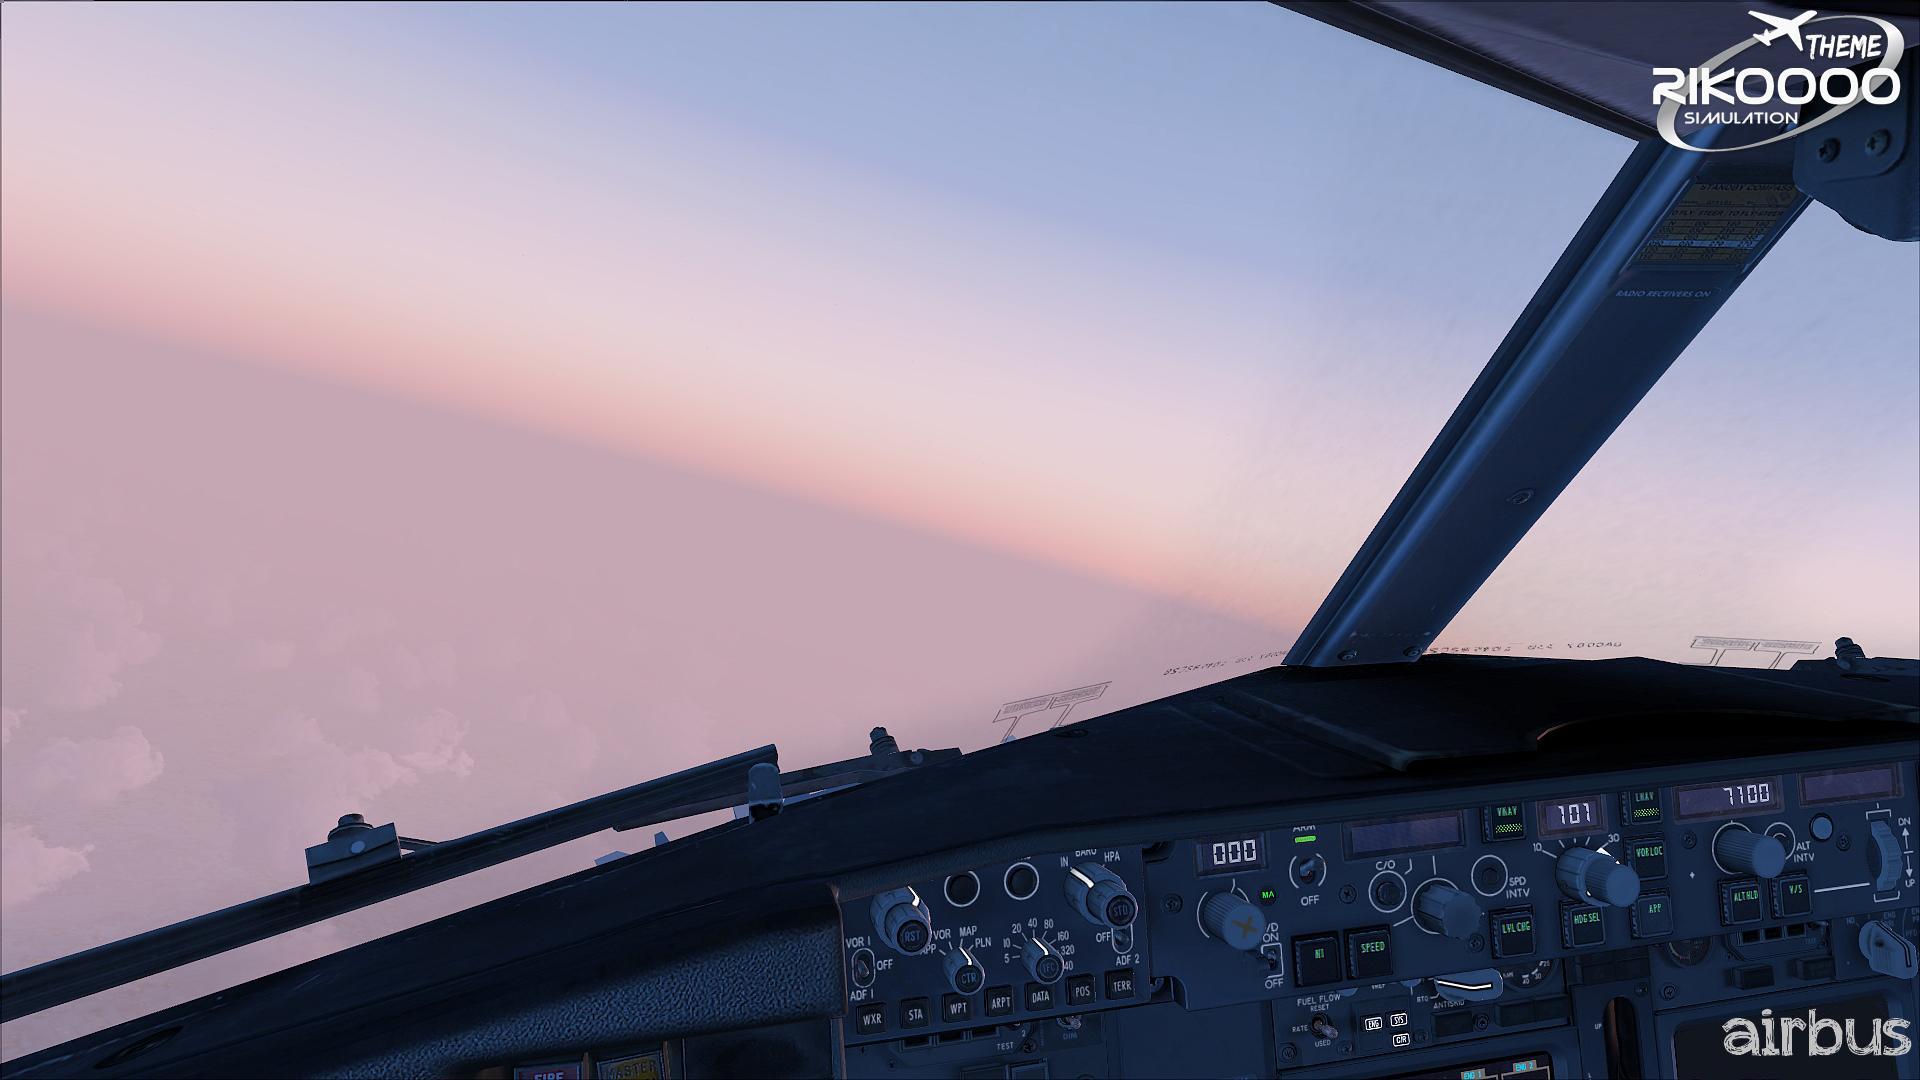 एयरबस 1